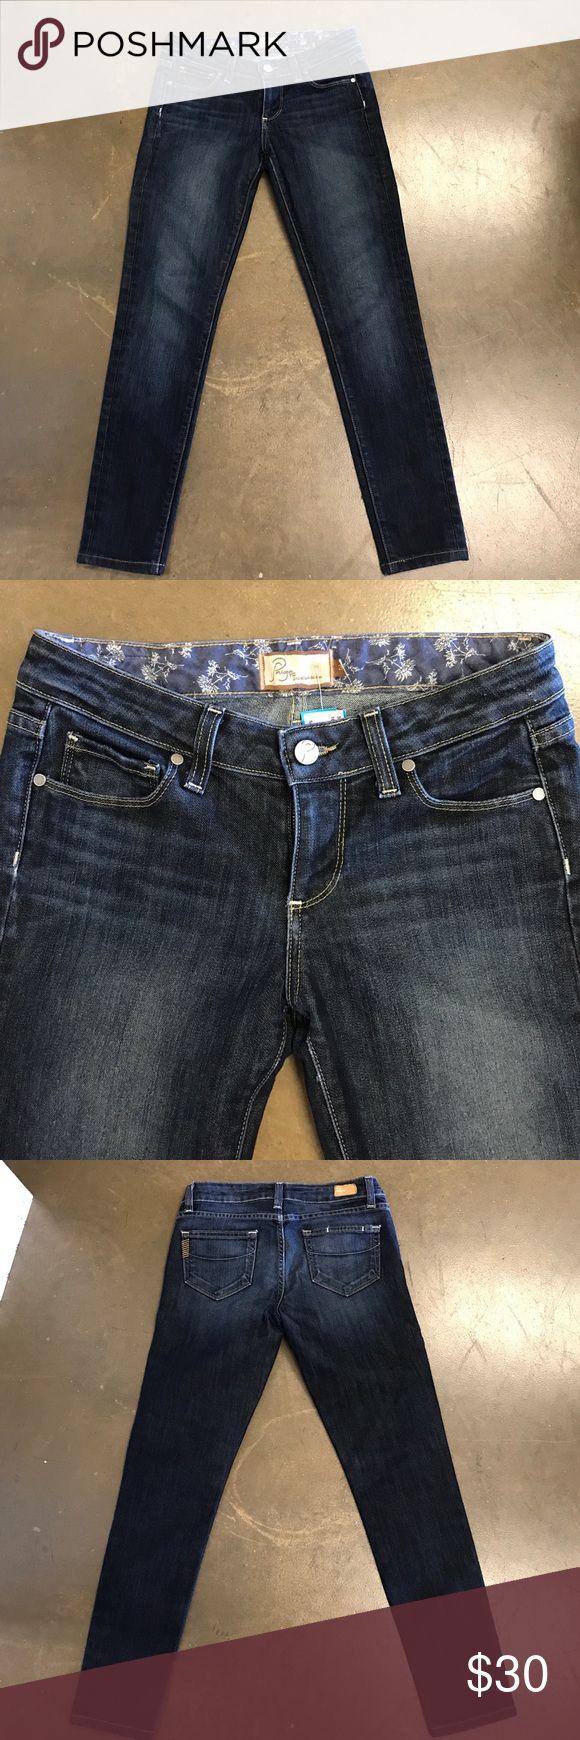 Paige jean size 26 Paige jean skyline drive style size 26 (runs small) Paige Jeans Jeans